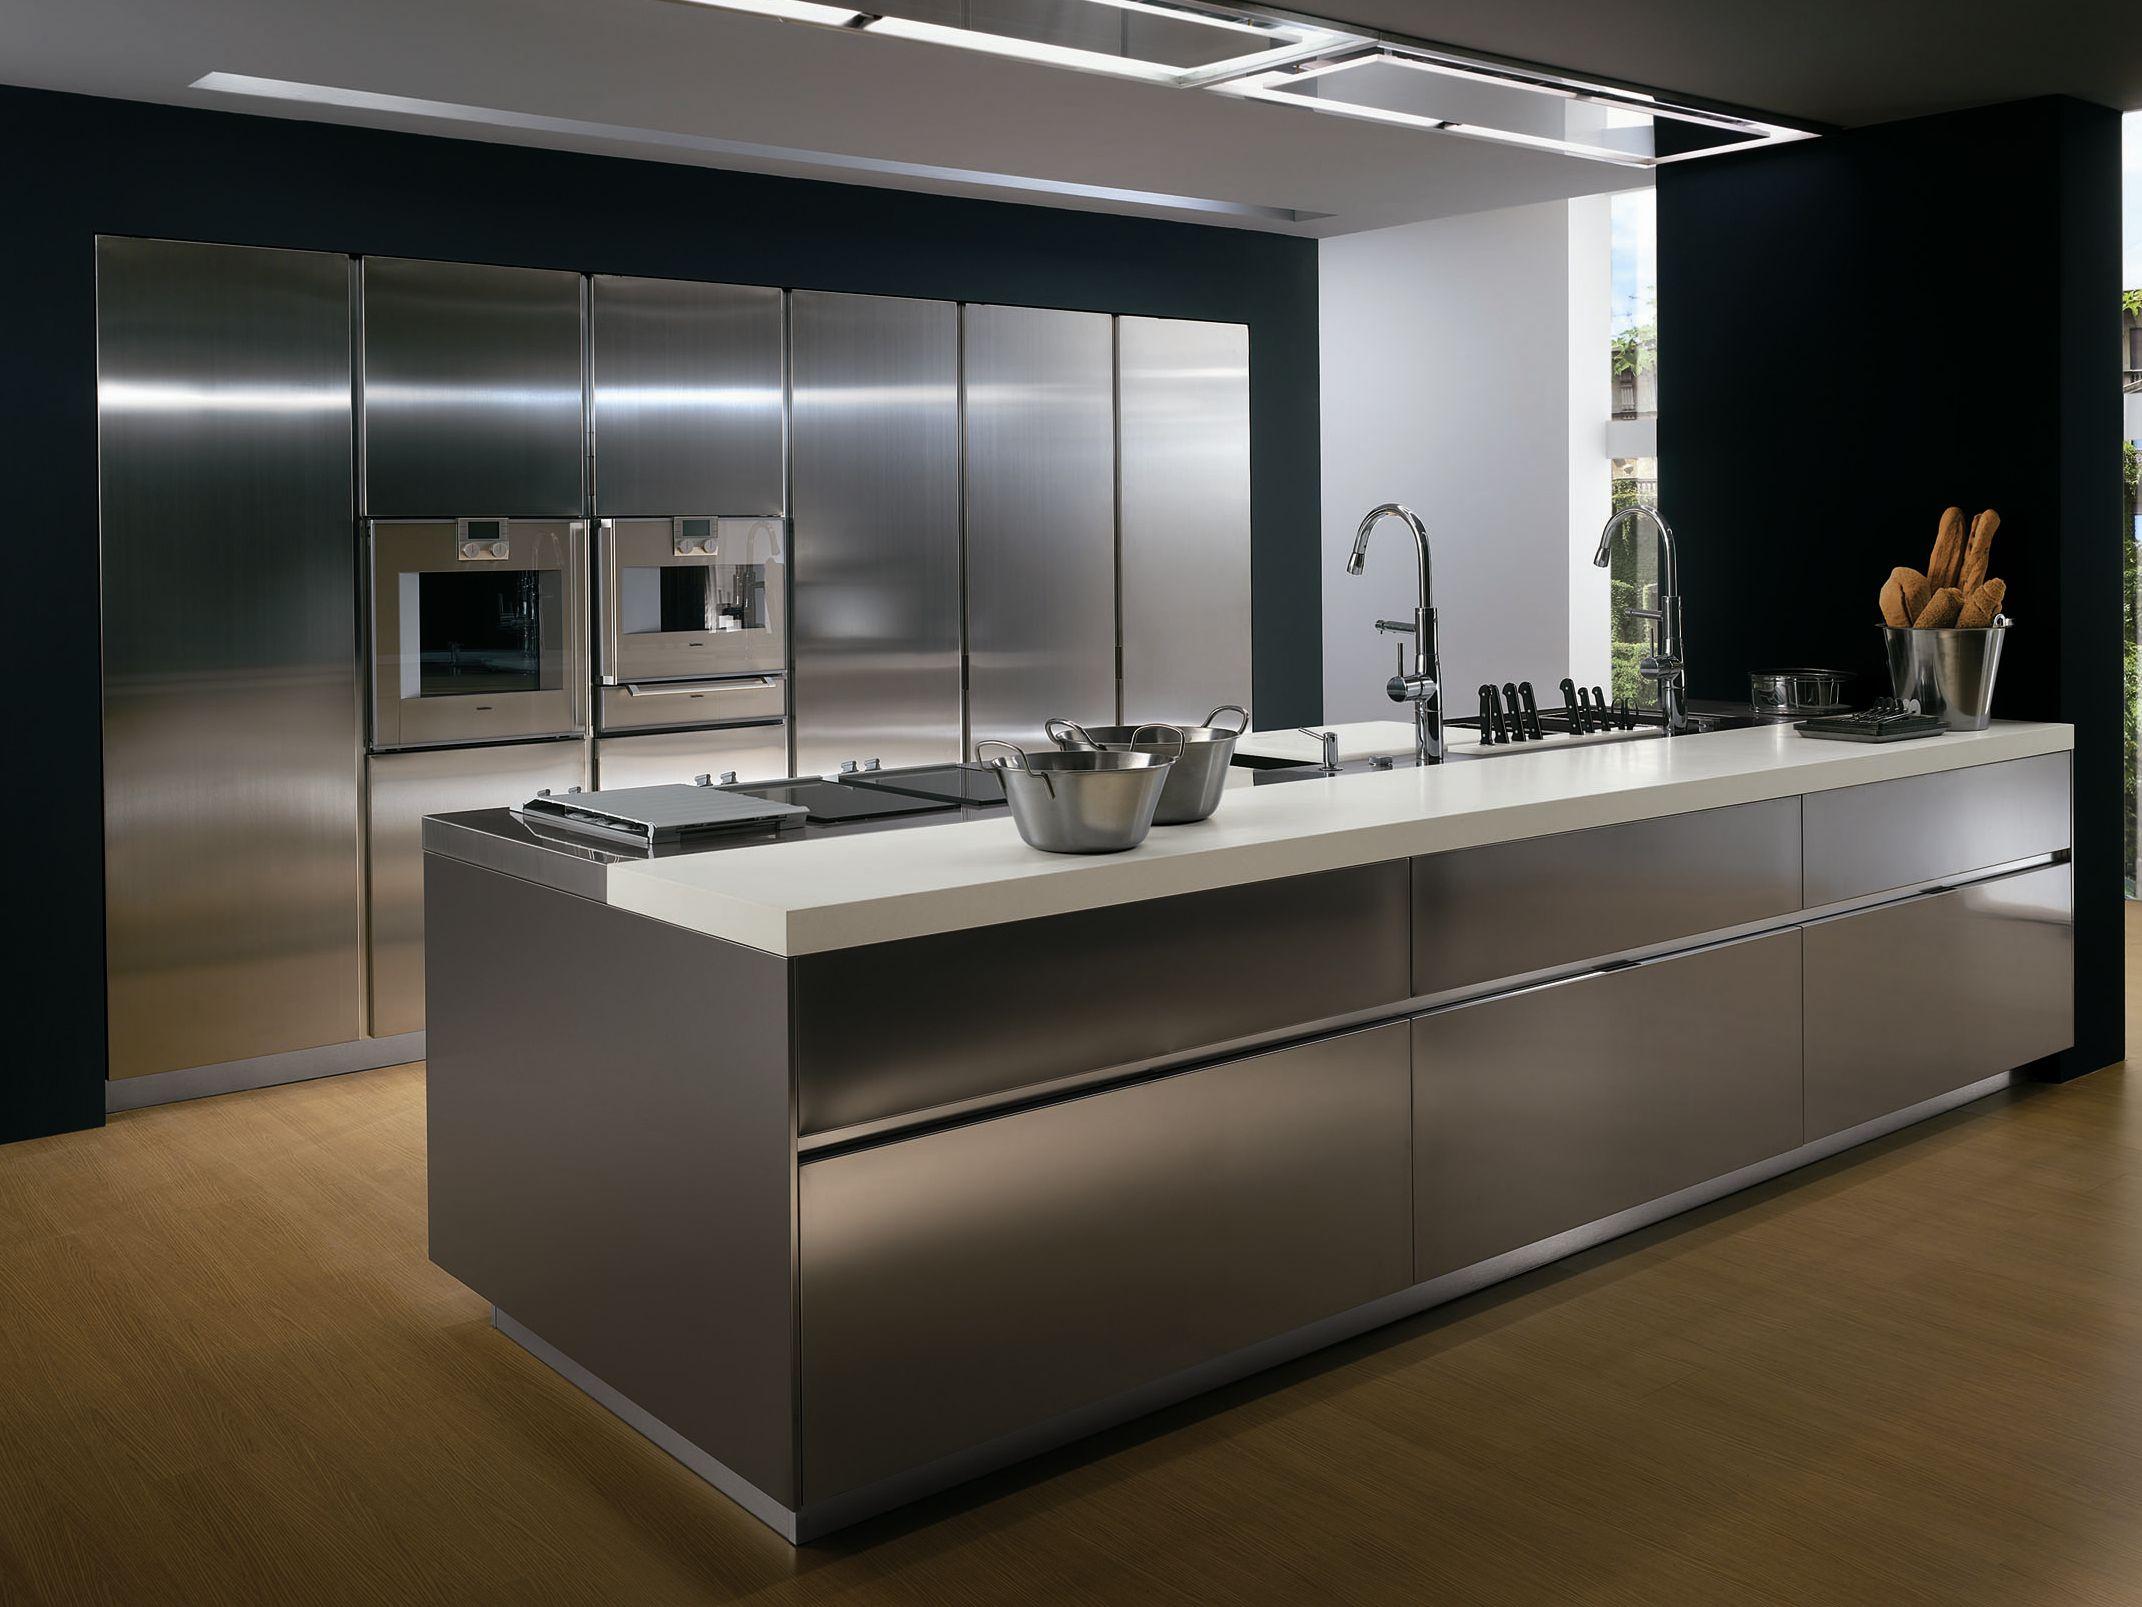 Cucina senza maniglie ICON By ERNESTOMEDA design Giuseppe Bavuso